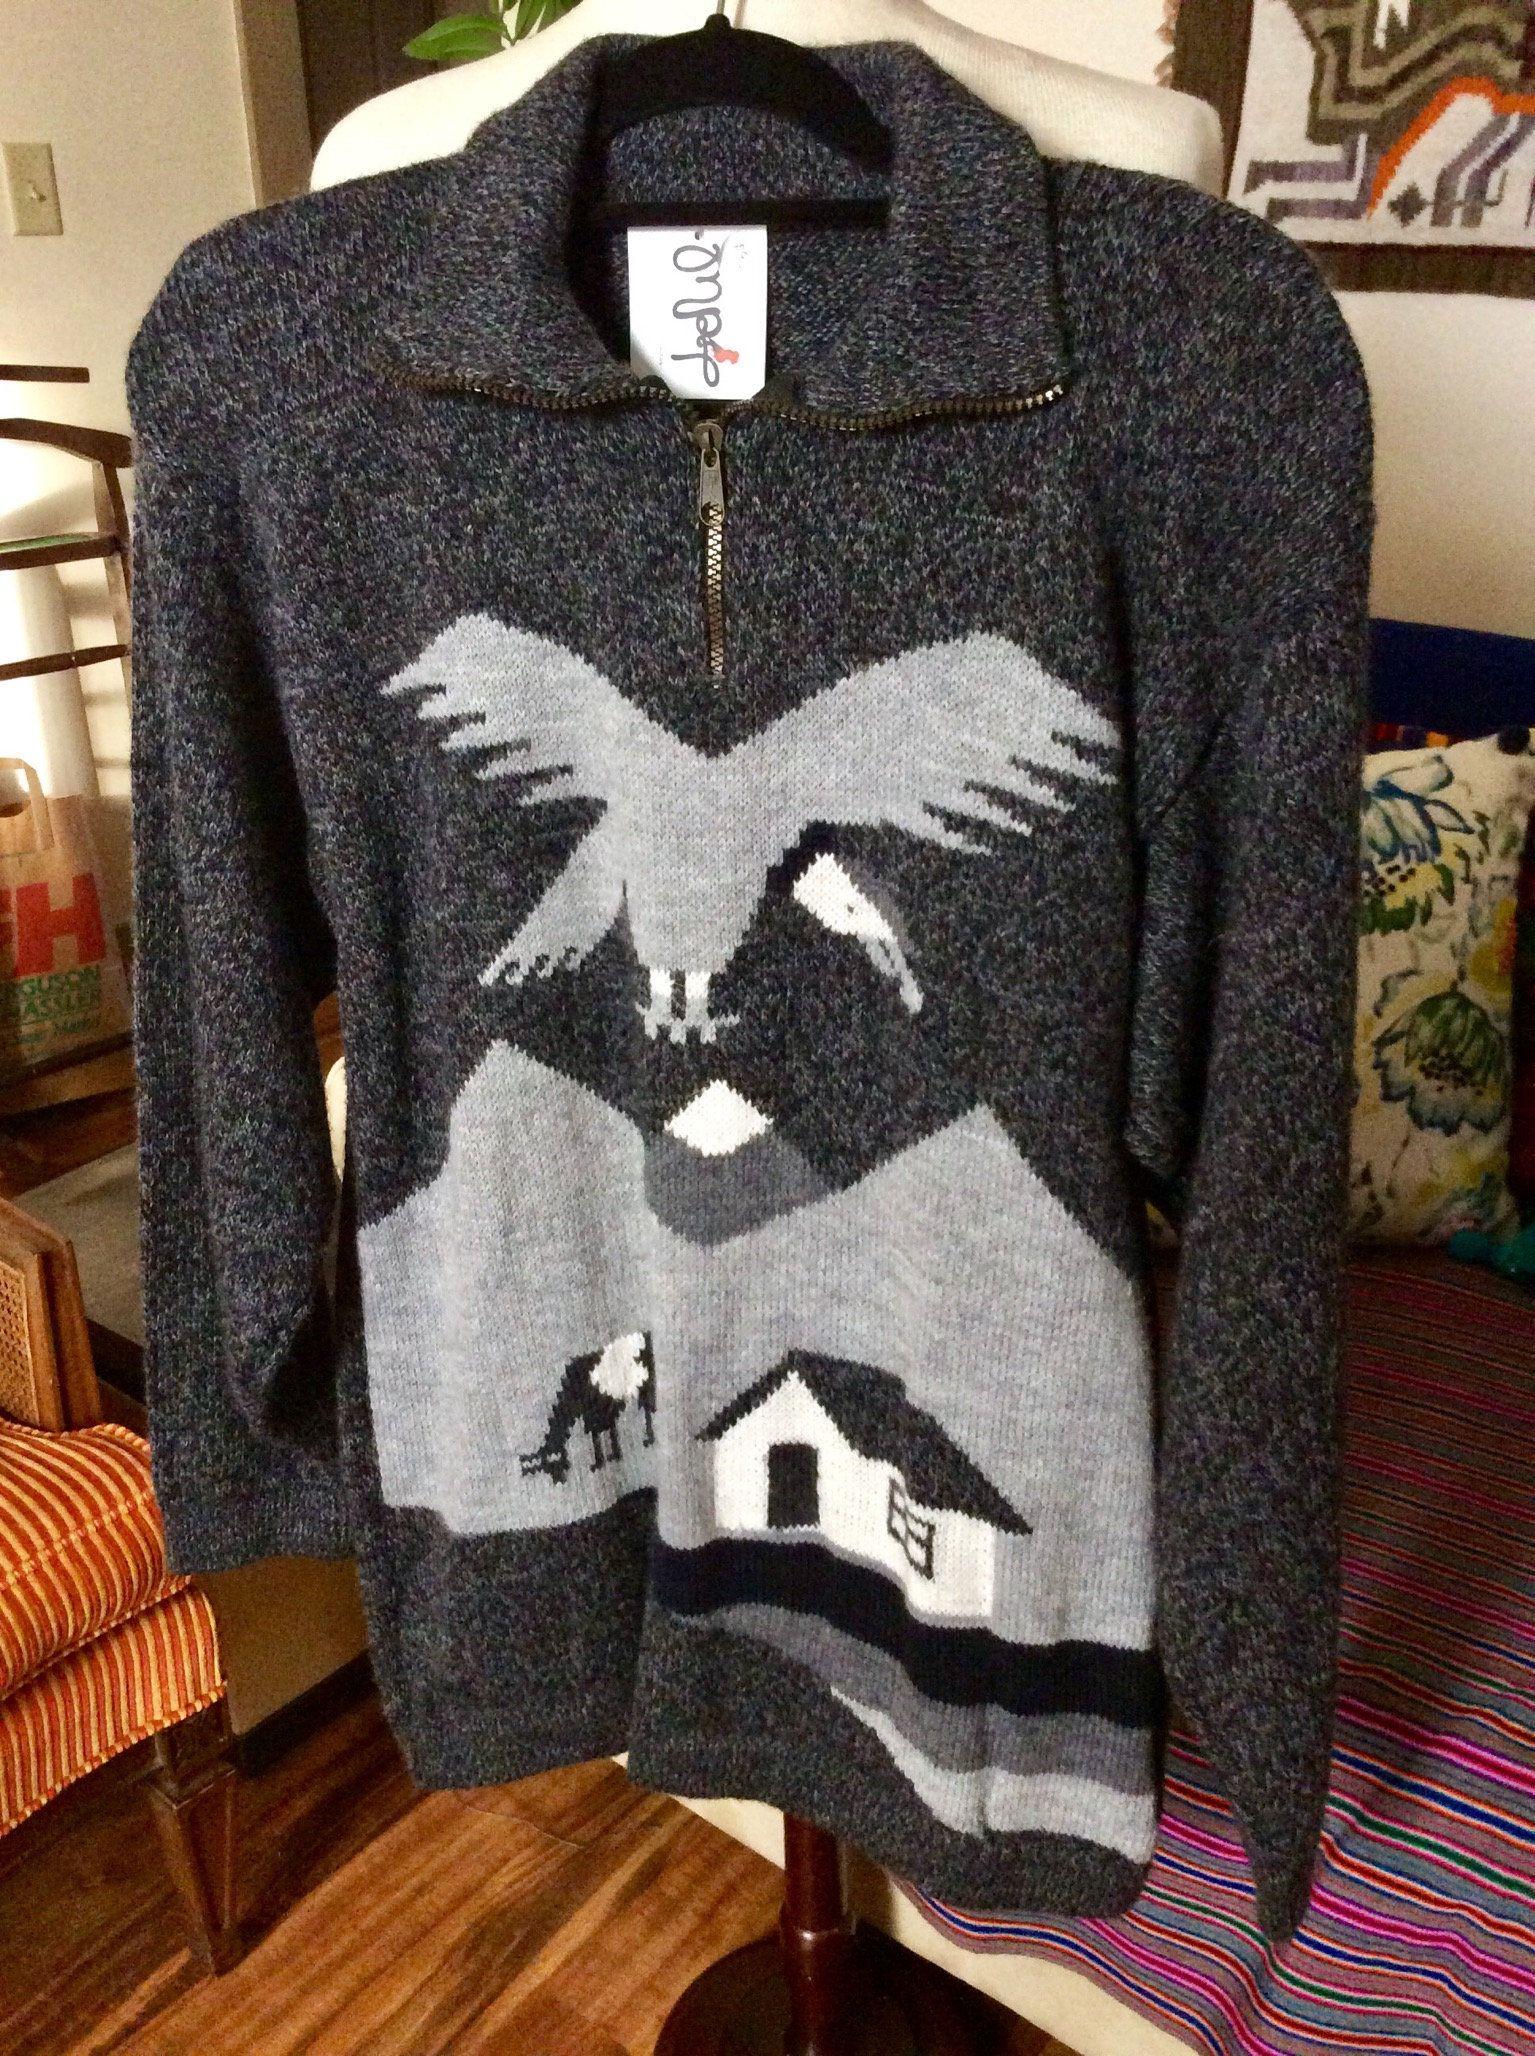 Crew neck unisex Soft Alpaca Sweater,My Peruvian Treasures,Peruvian alpaca sweater,Warm Alpaca sweater,Artisan Made sweater,Made in Peru